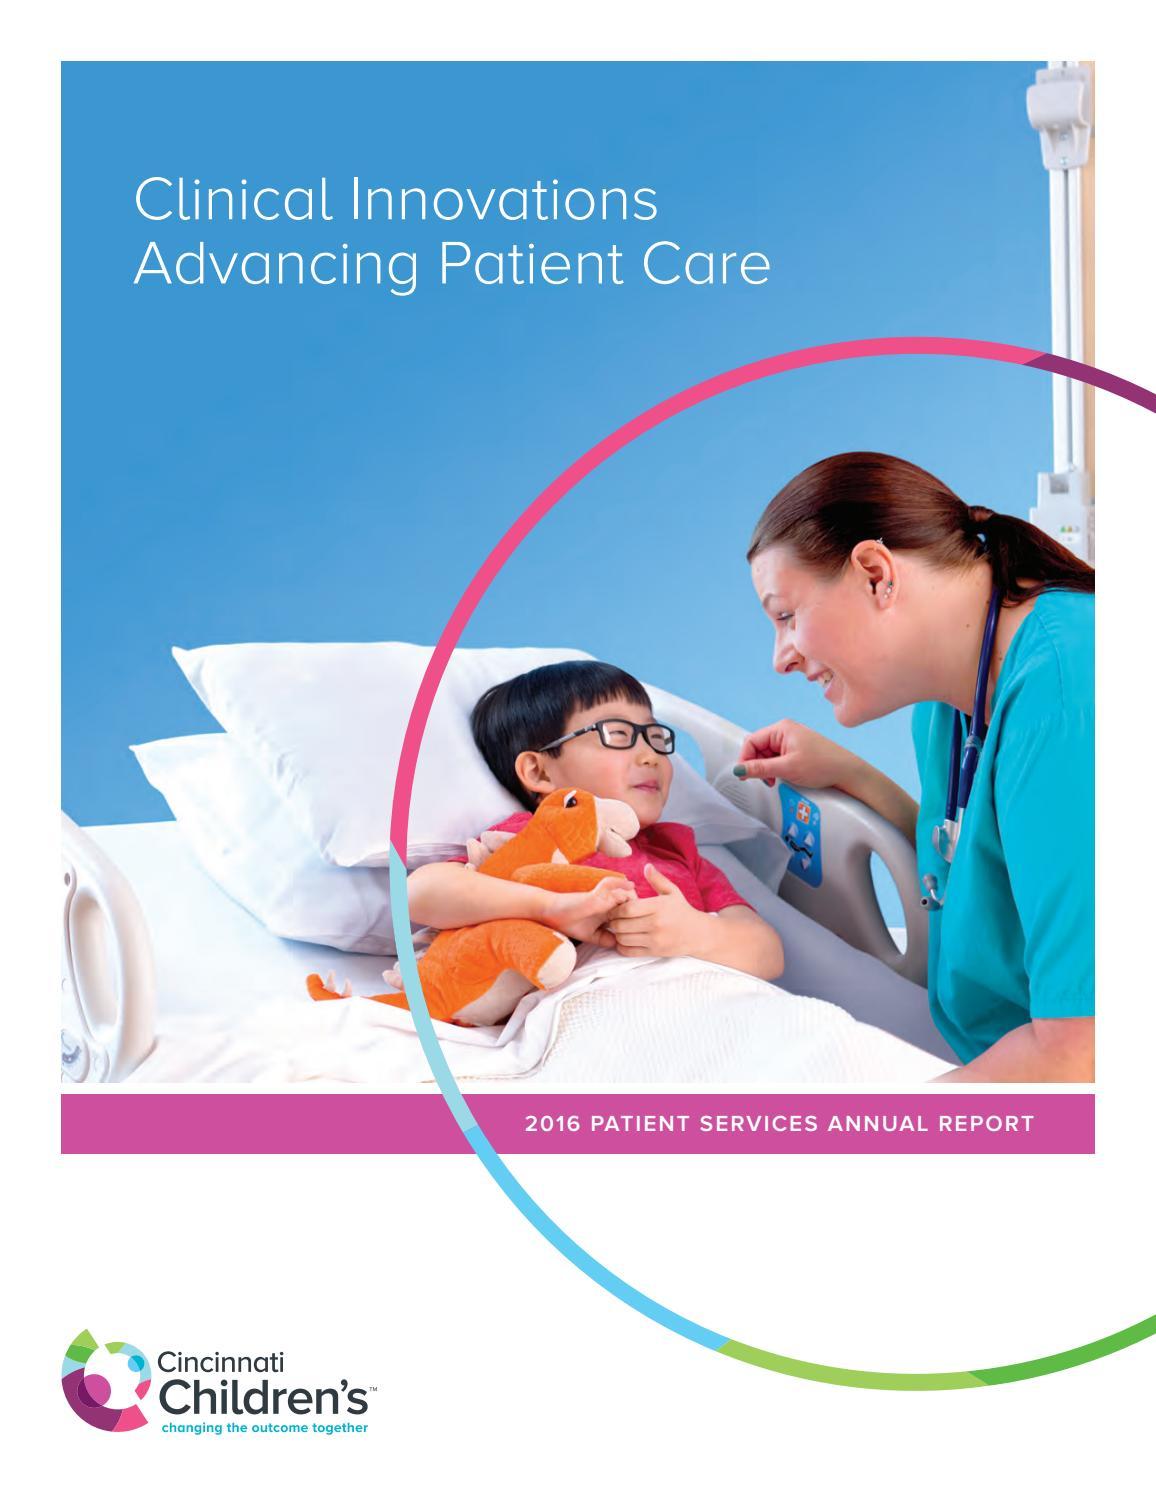 Cincinnati Children's 2016 Patient Services Annual Report